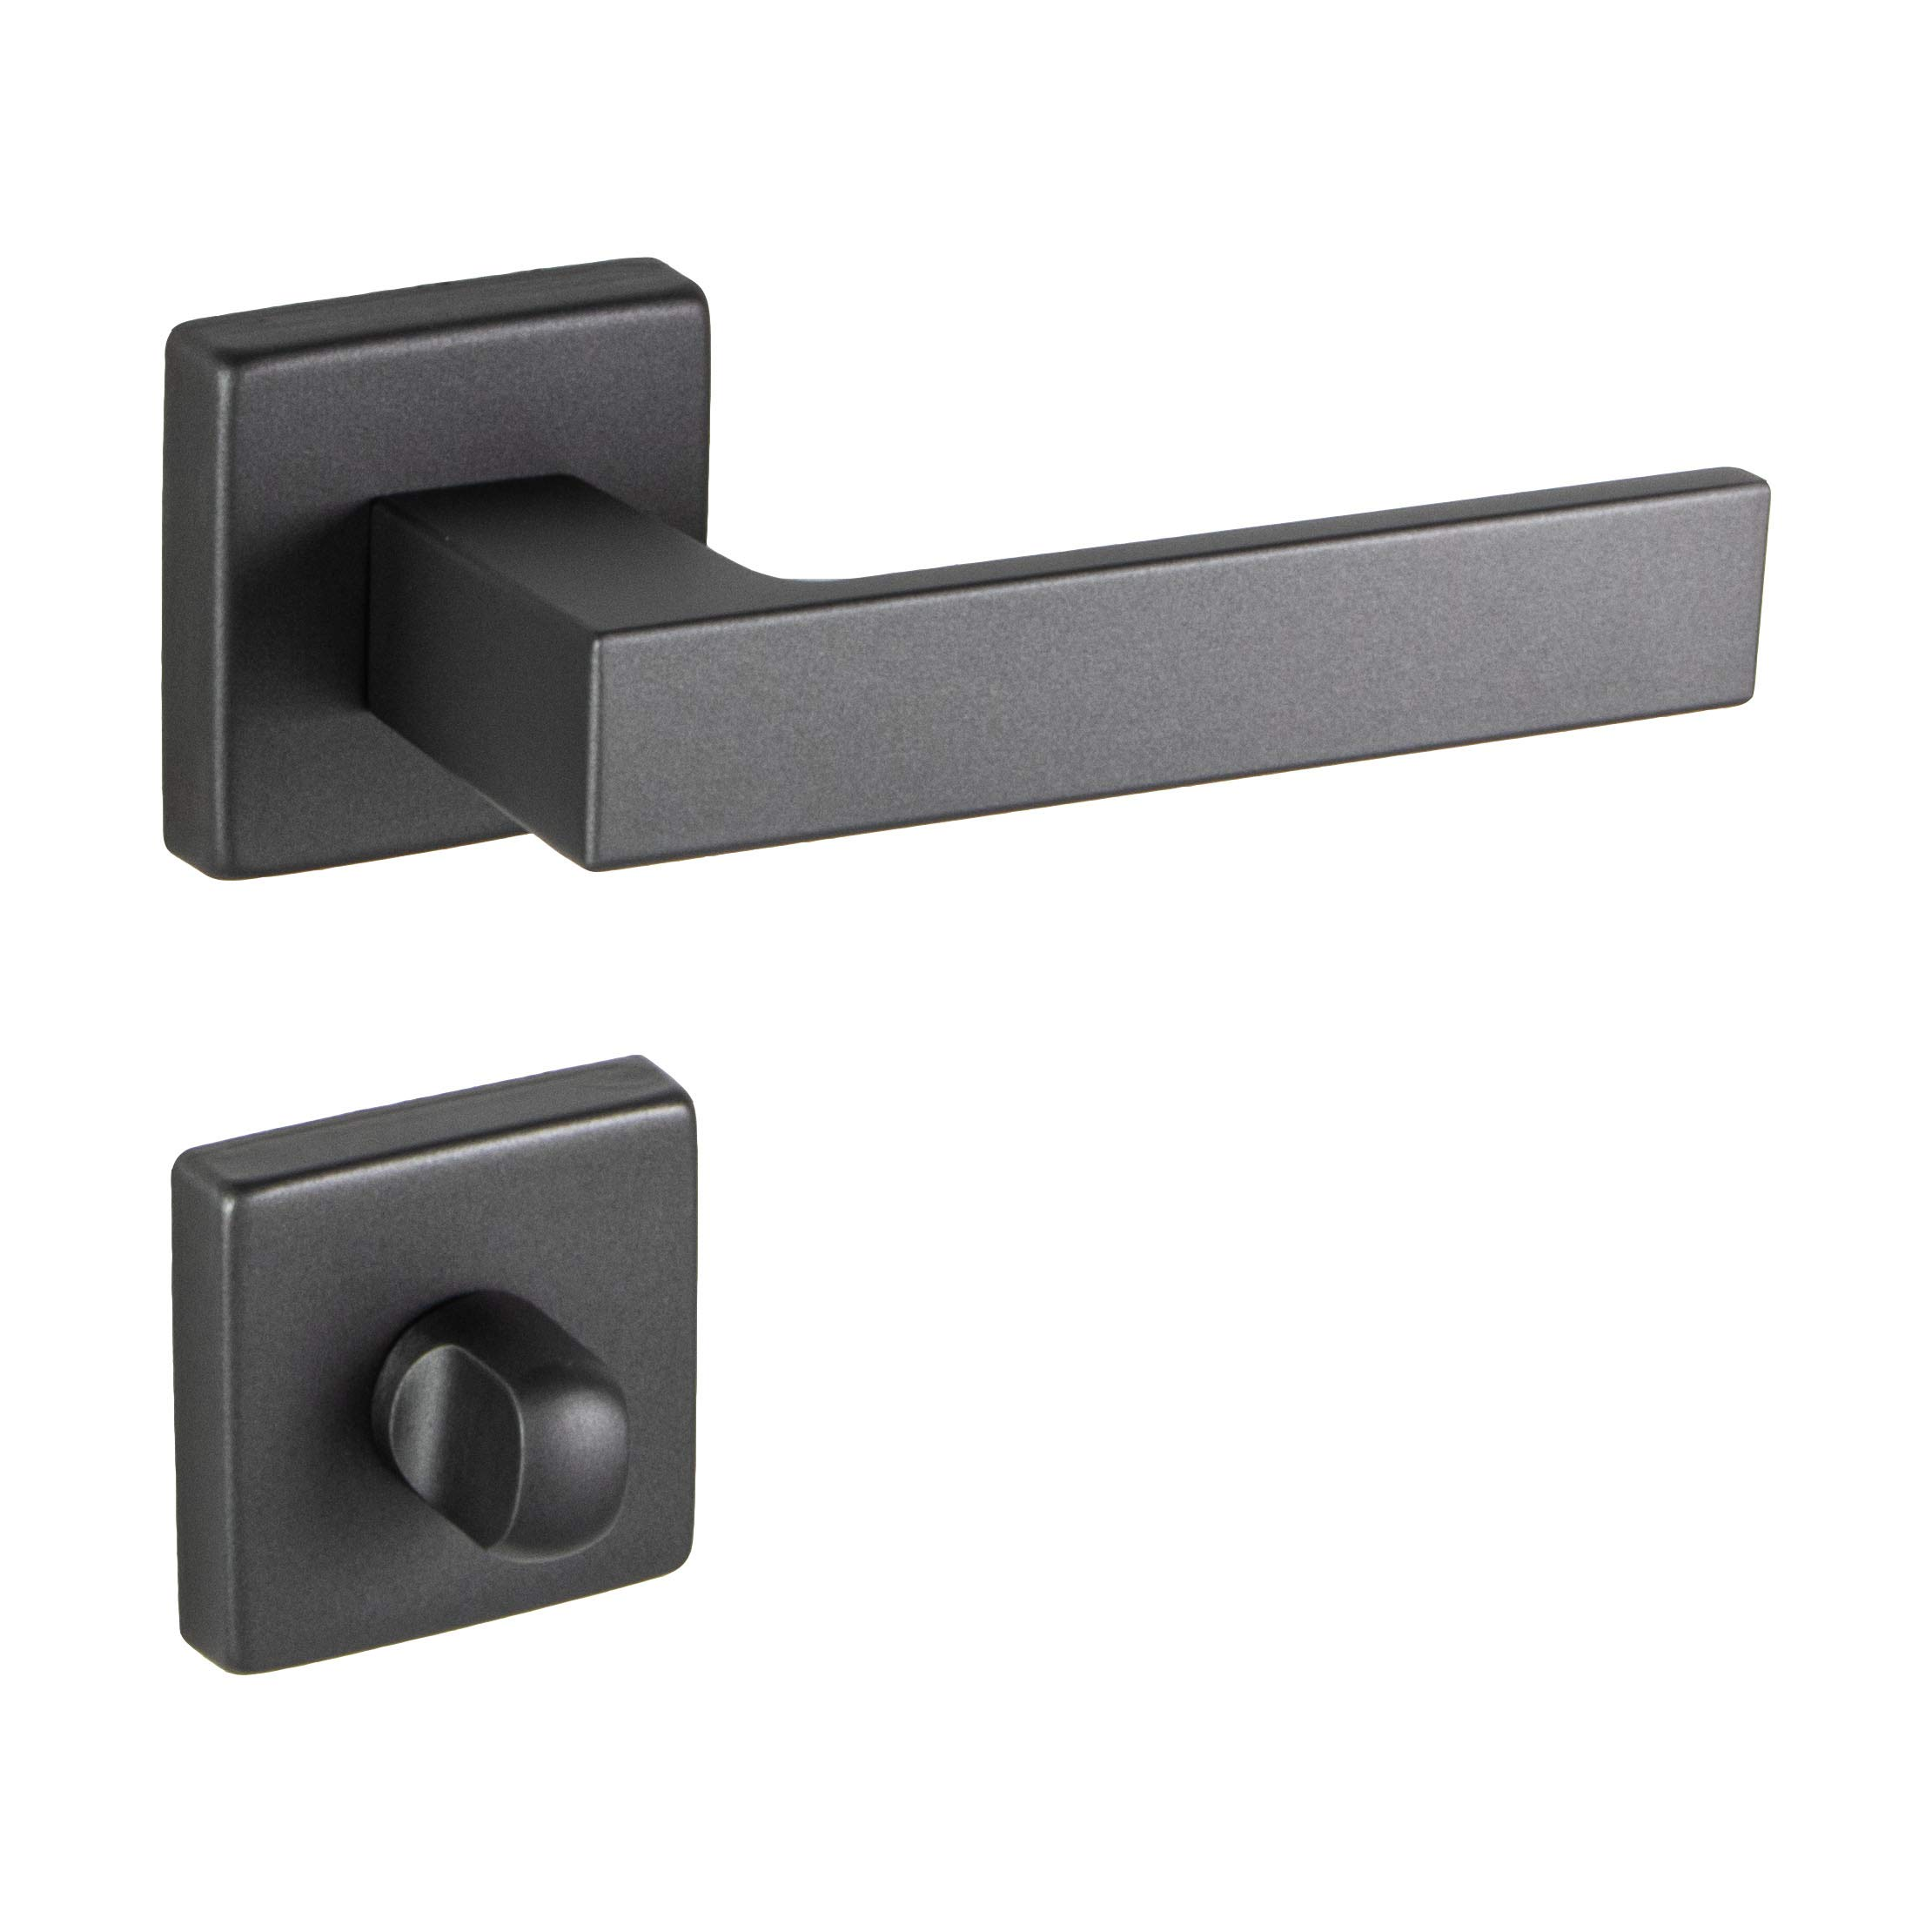 Juva Door Handles Push 1317 Durable Aluminium Handle For Bathroom Doors Modern Ergonomic Design Aluminum Anthracite For Door Sizes 35 47 Mm Thickness Amazon Co Uk Diy Tools